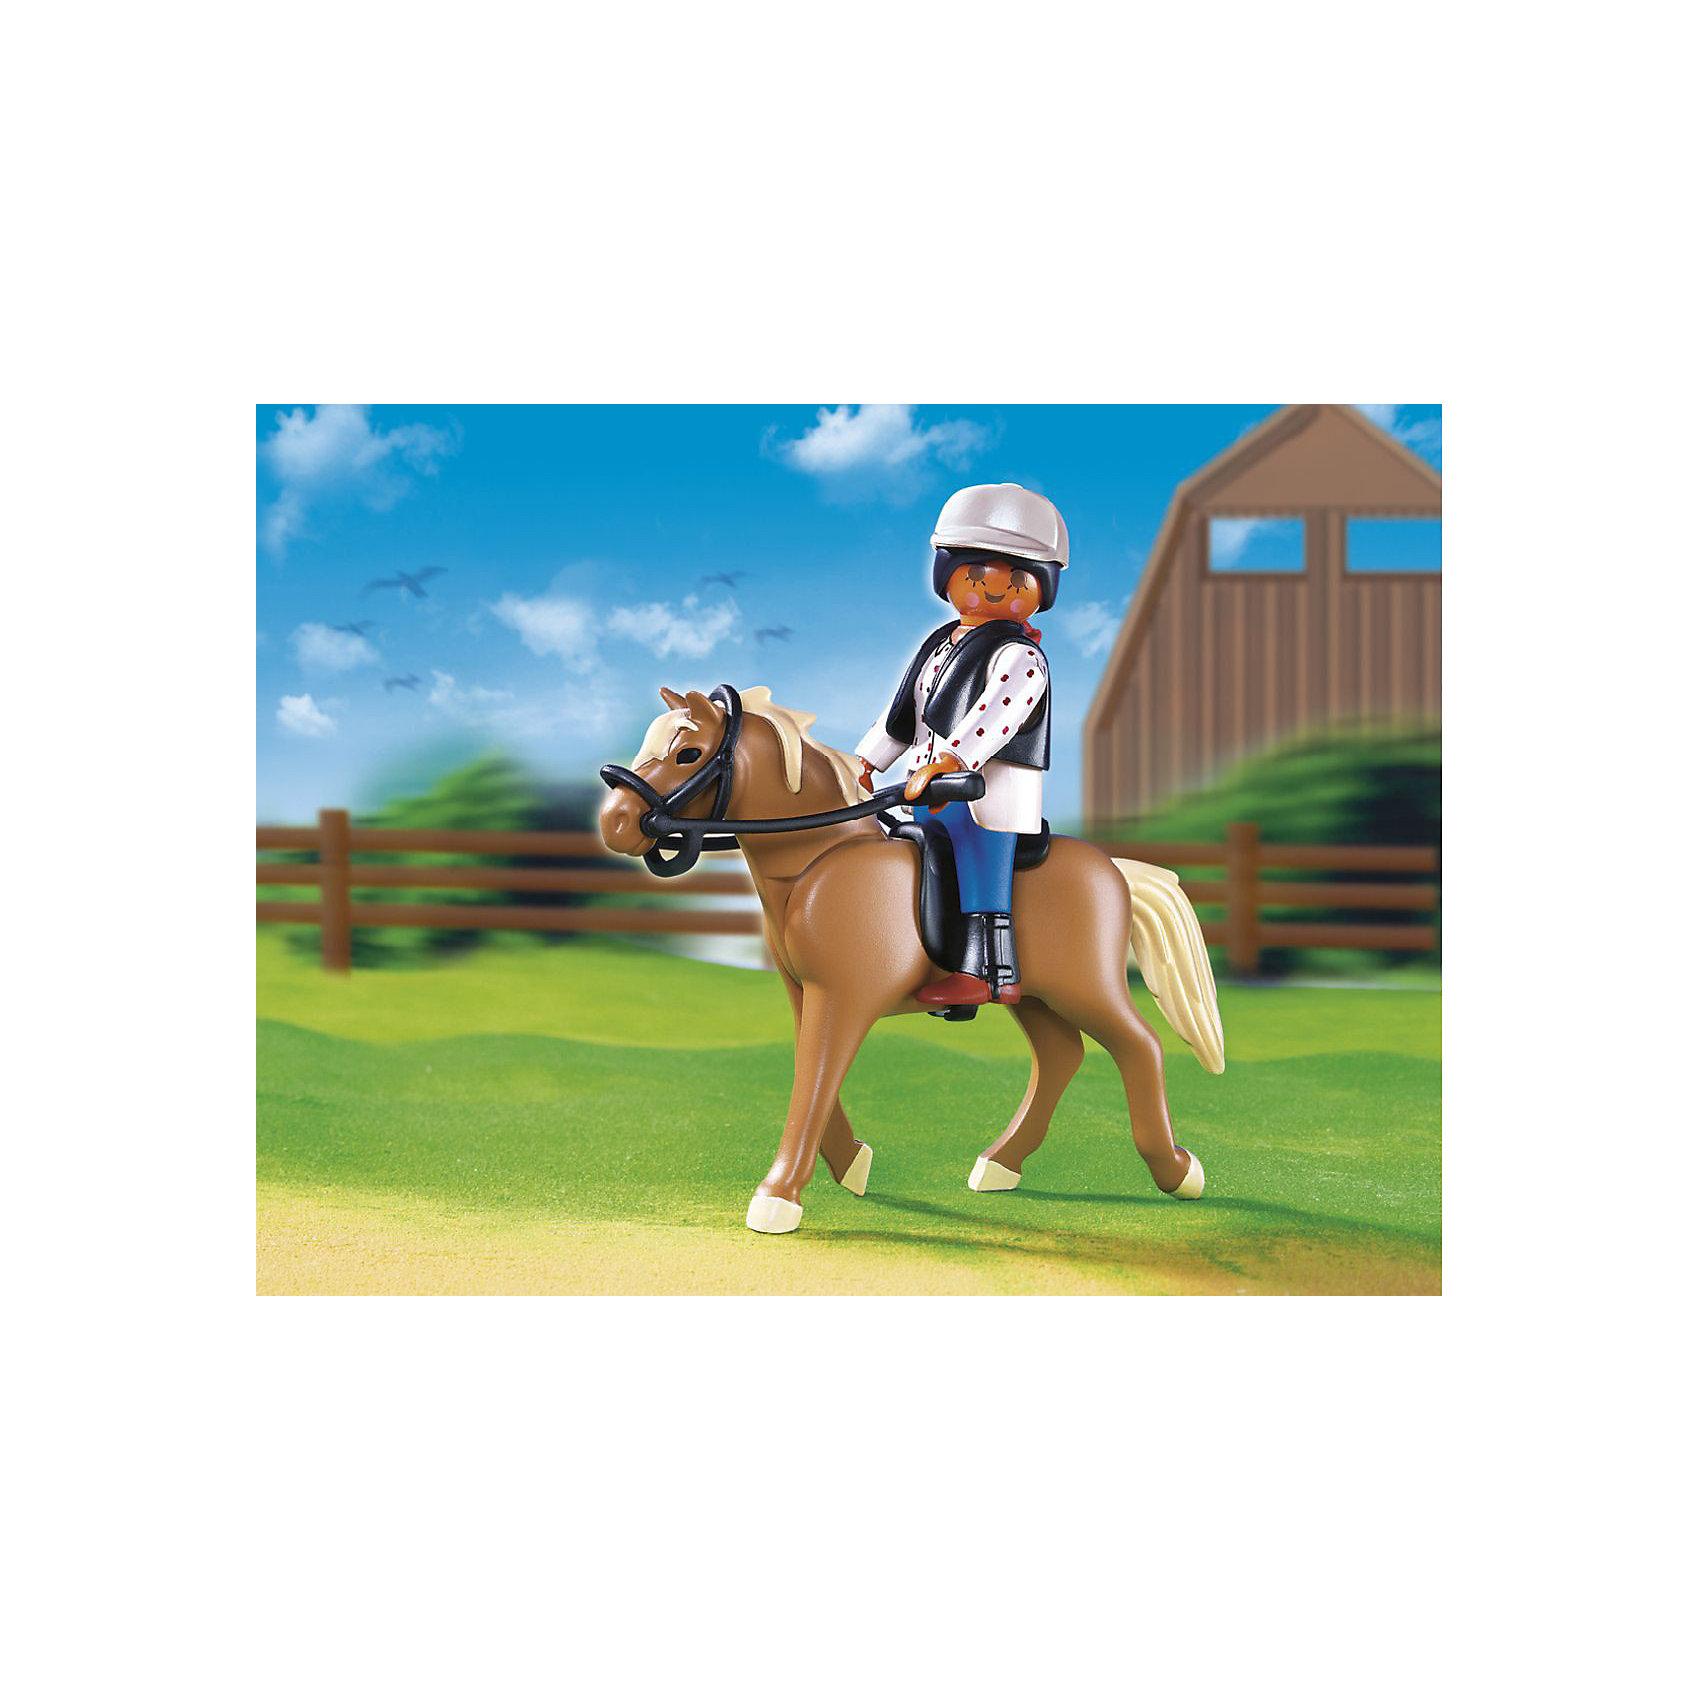 PLAYMOBIL® PLAYMOBIL 5109 Конный клуб: Лошадь Хафлингер со стойлом playmobil® playmobil 5546 парк развлечений продавец шаров smileyworld